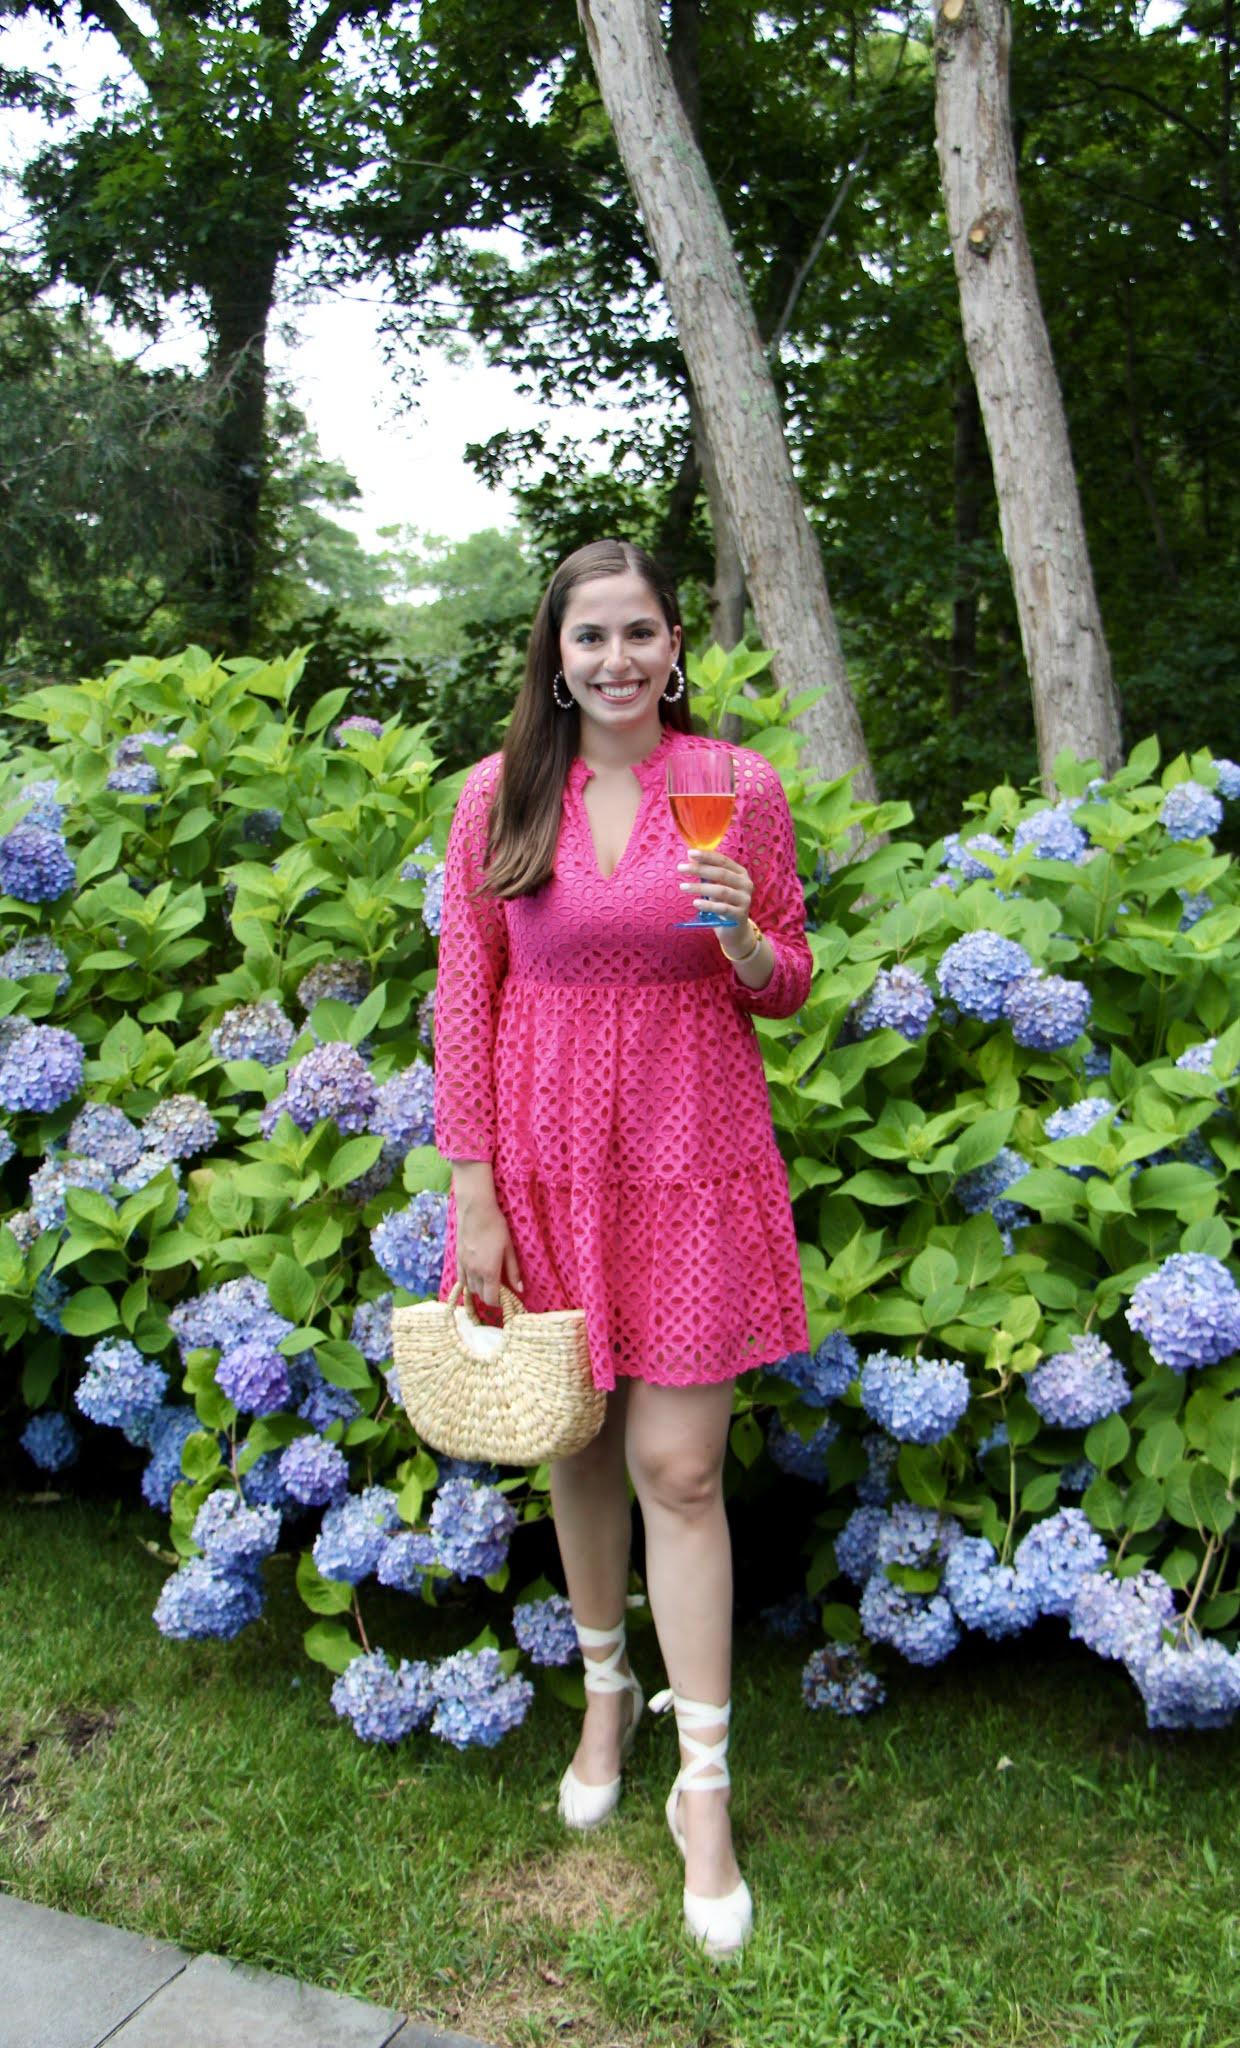 pink dress, hamptons, east hampton, aperol spritz, espadrilles, hydrangeas, straw bag, straw tote, long island